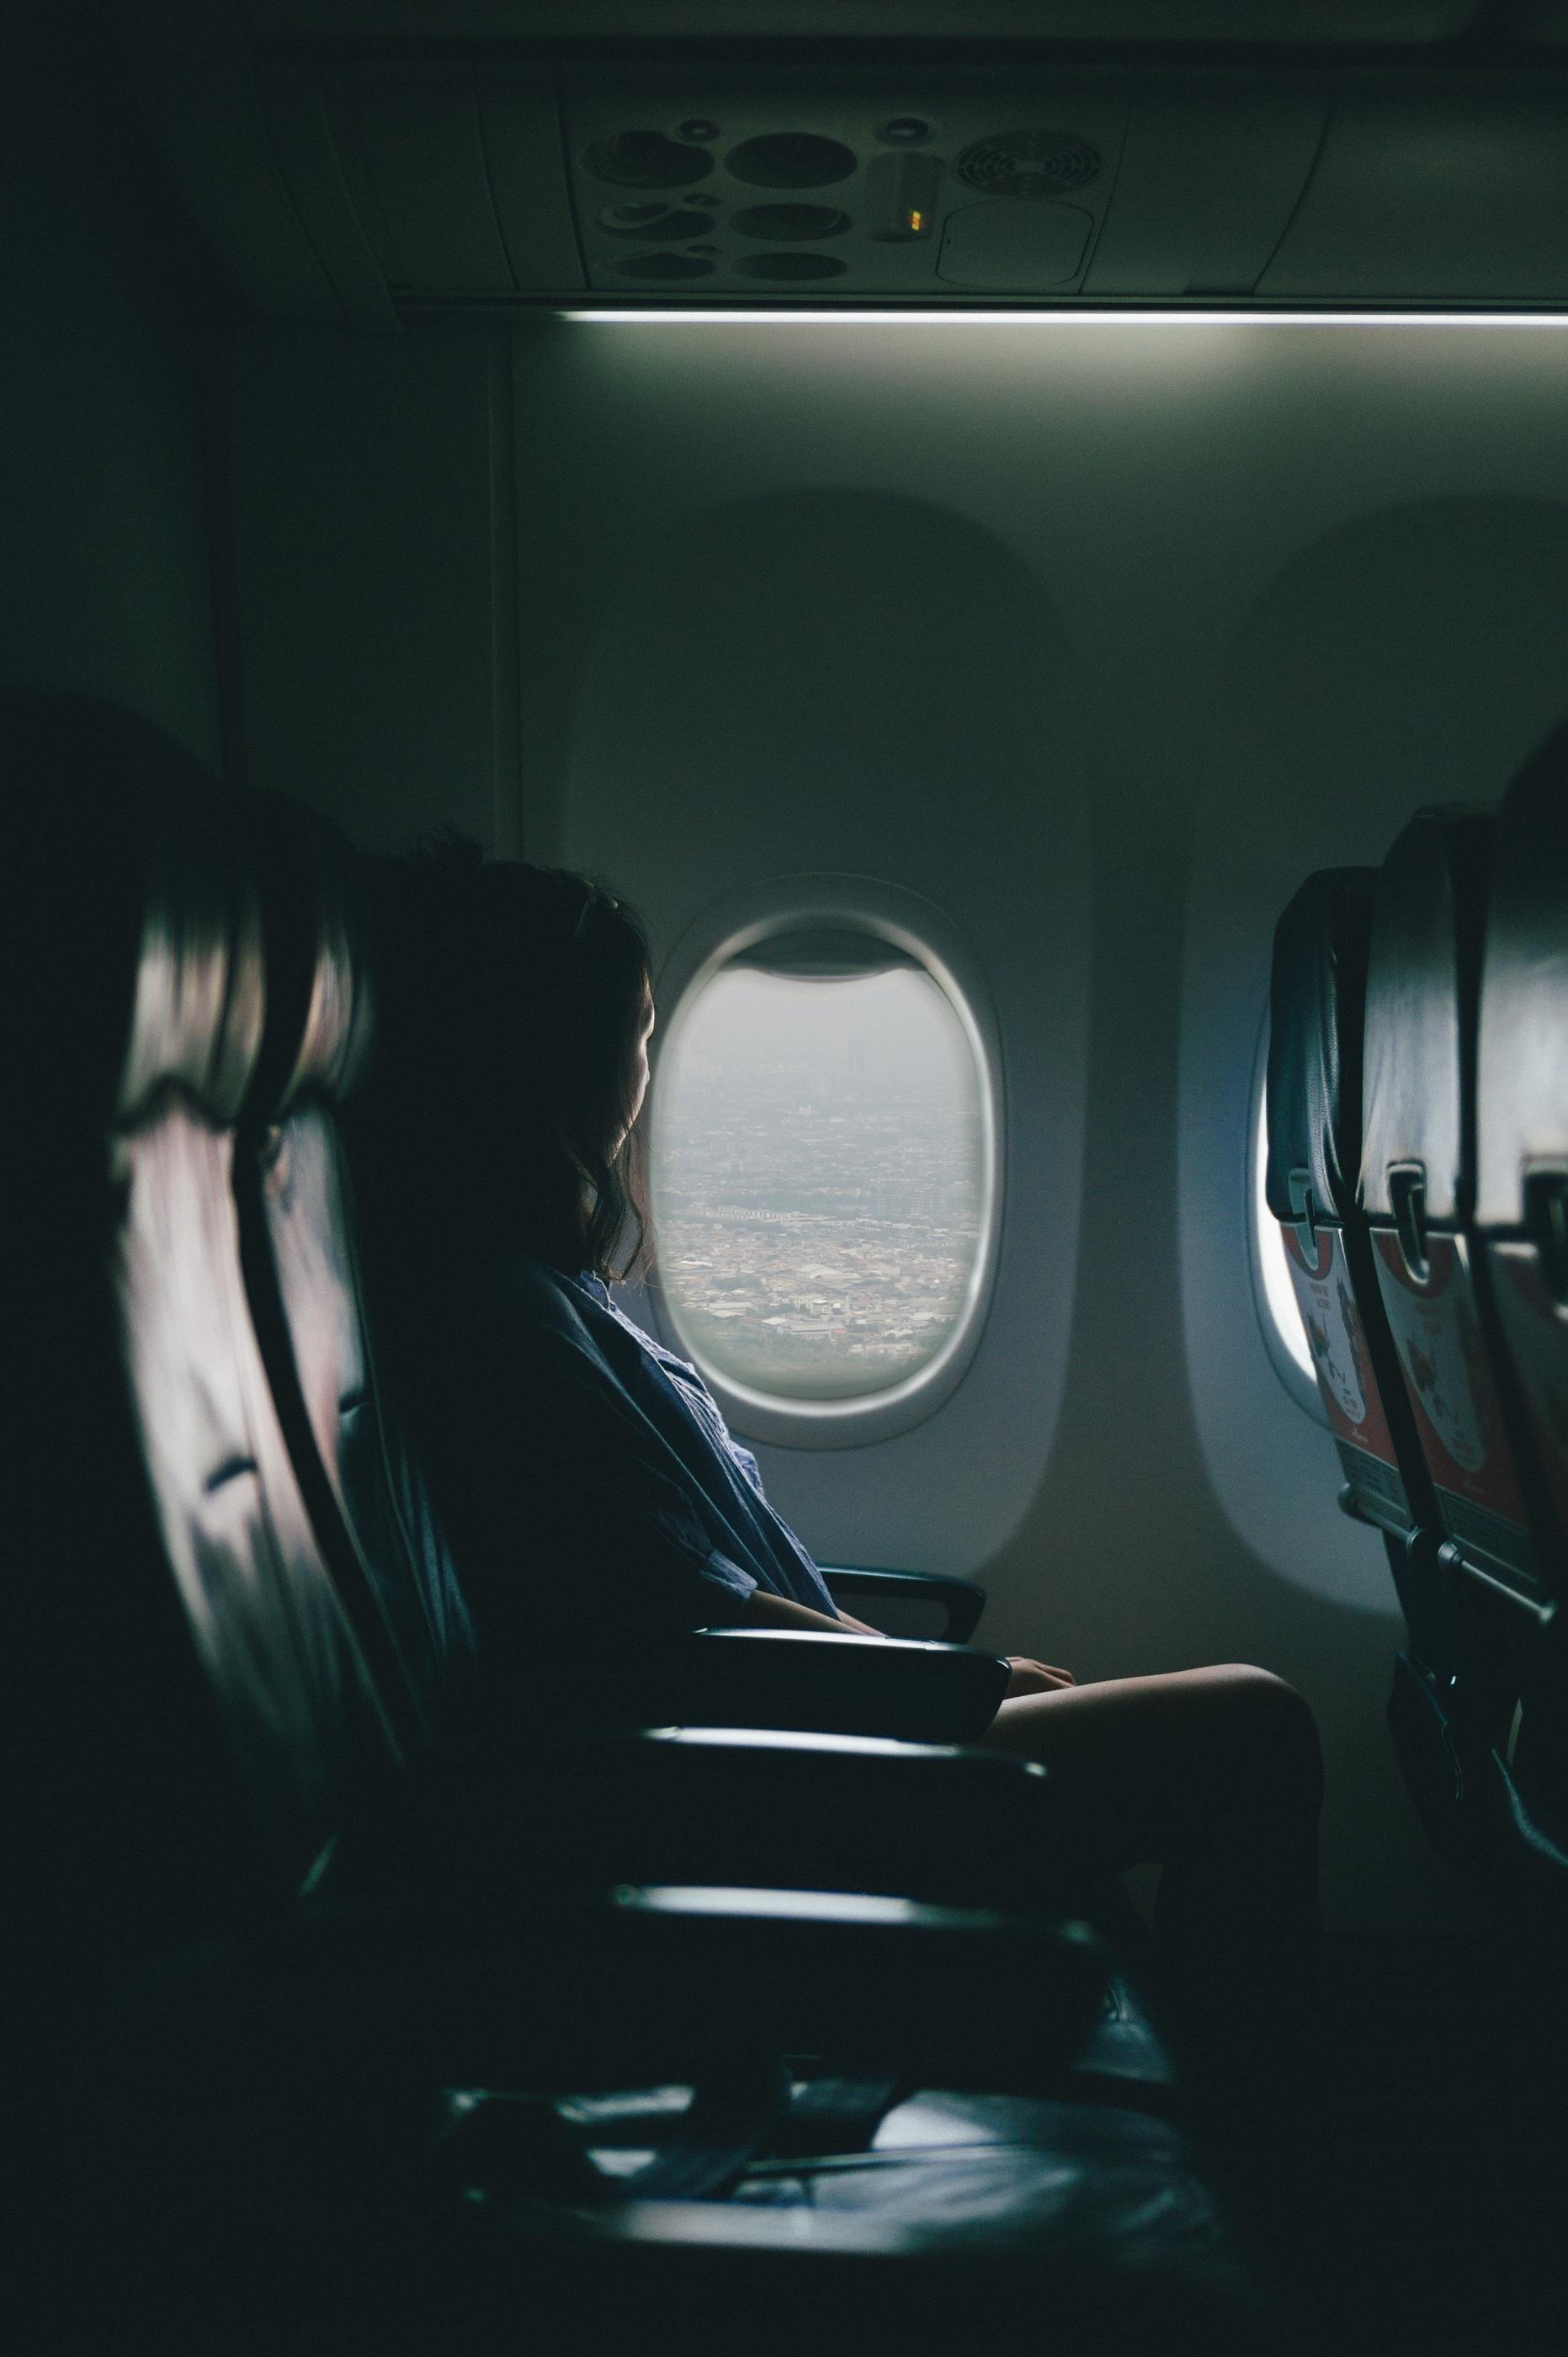 Gambar Orang Cahaya Wanita Pesawat Terbang Kegelapan Hitam